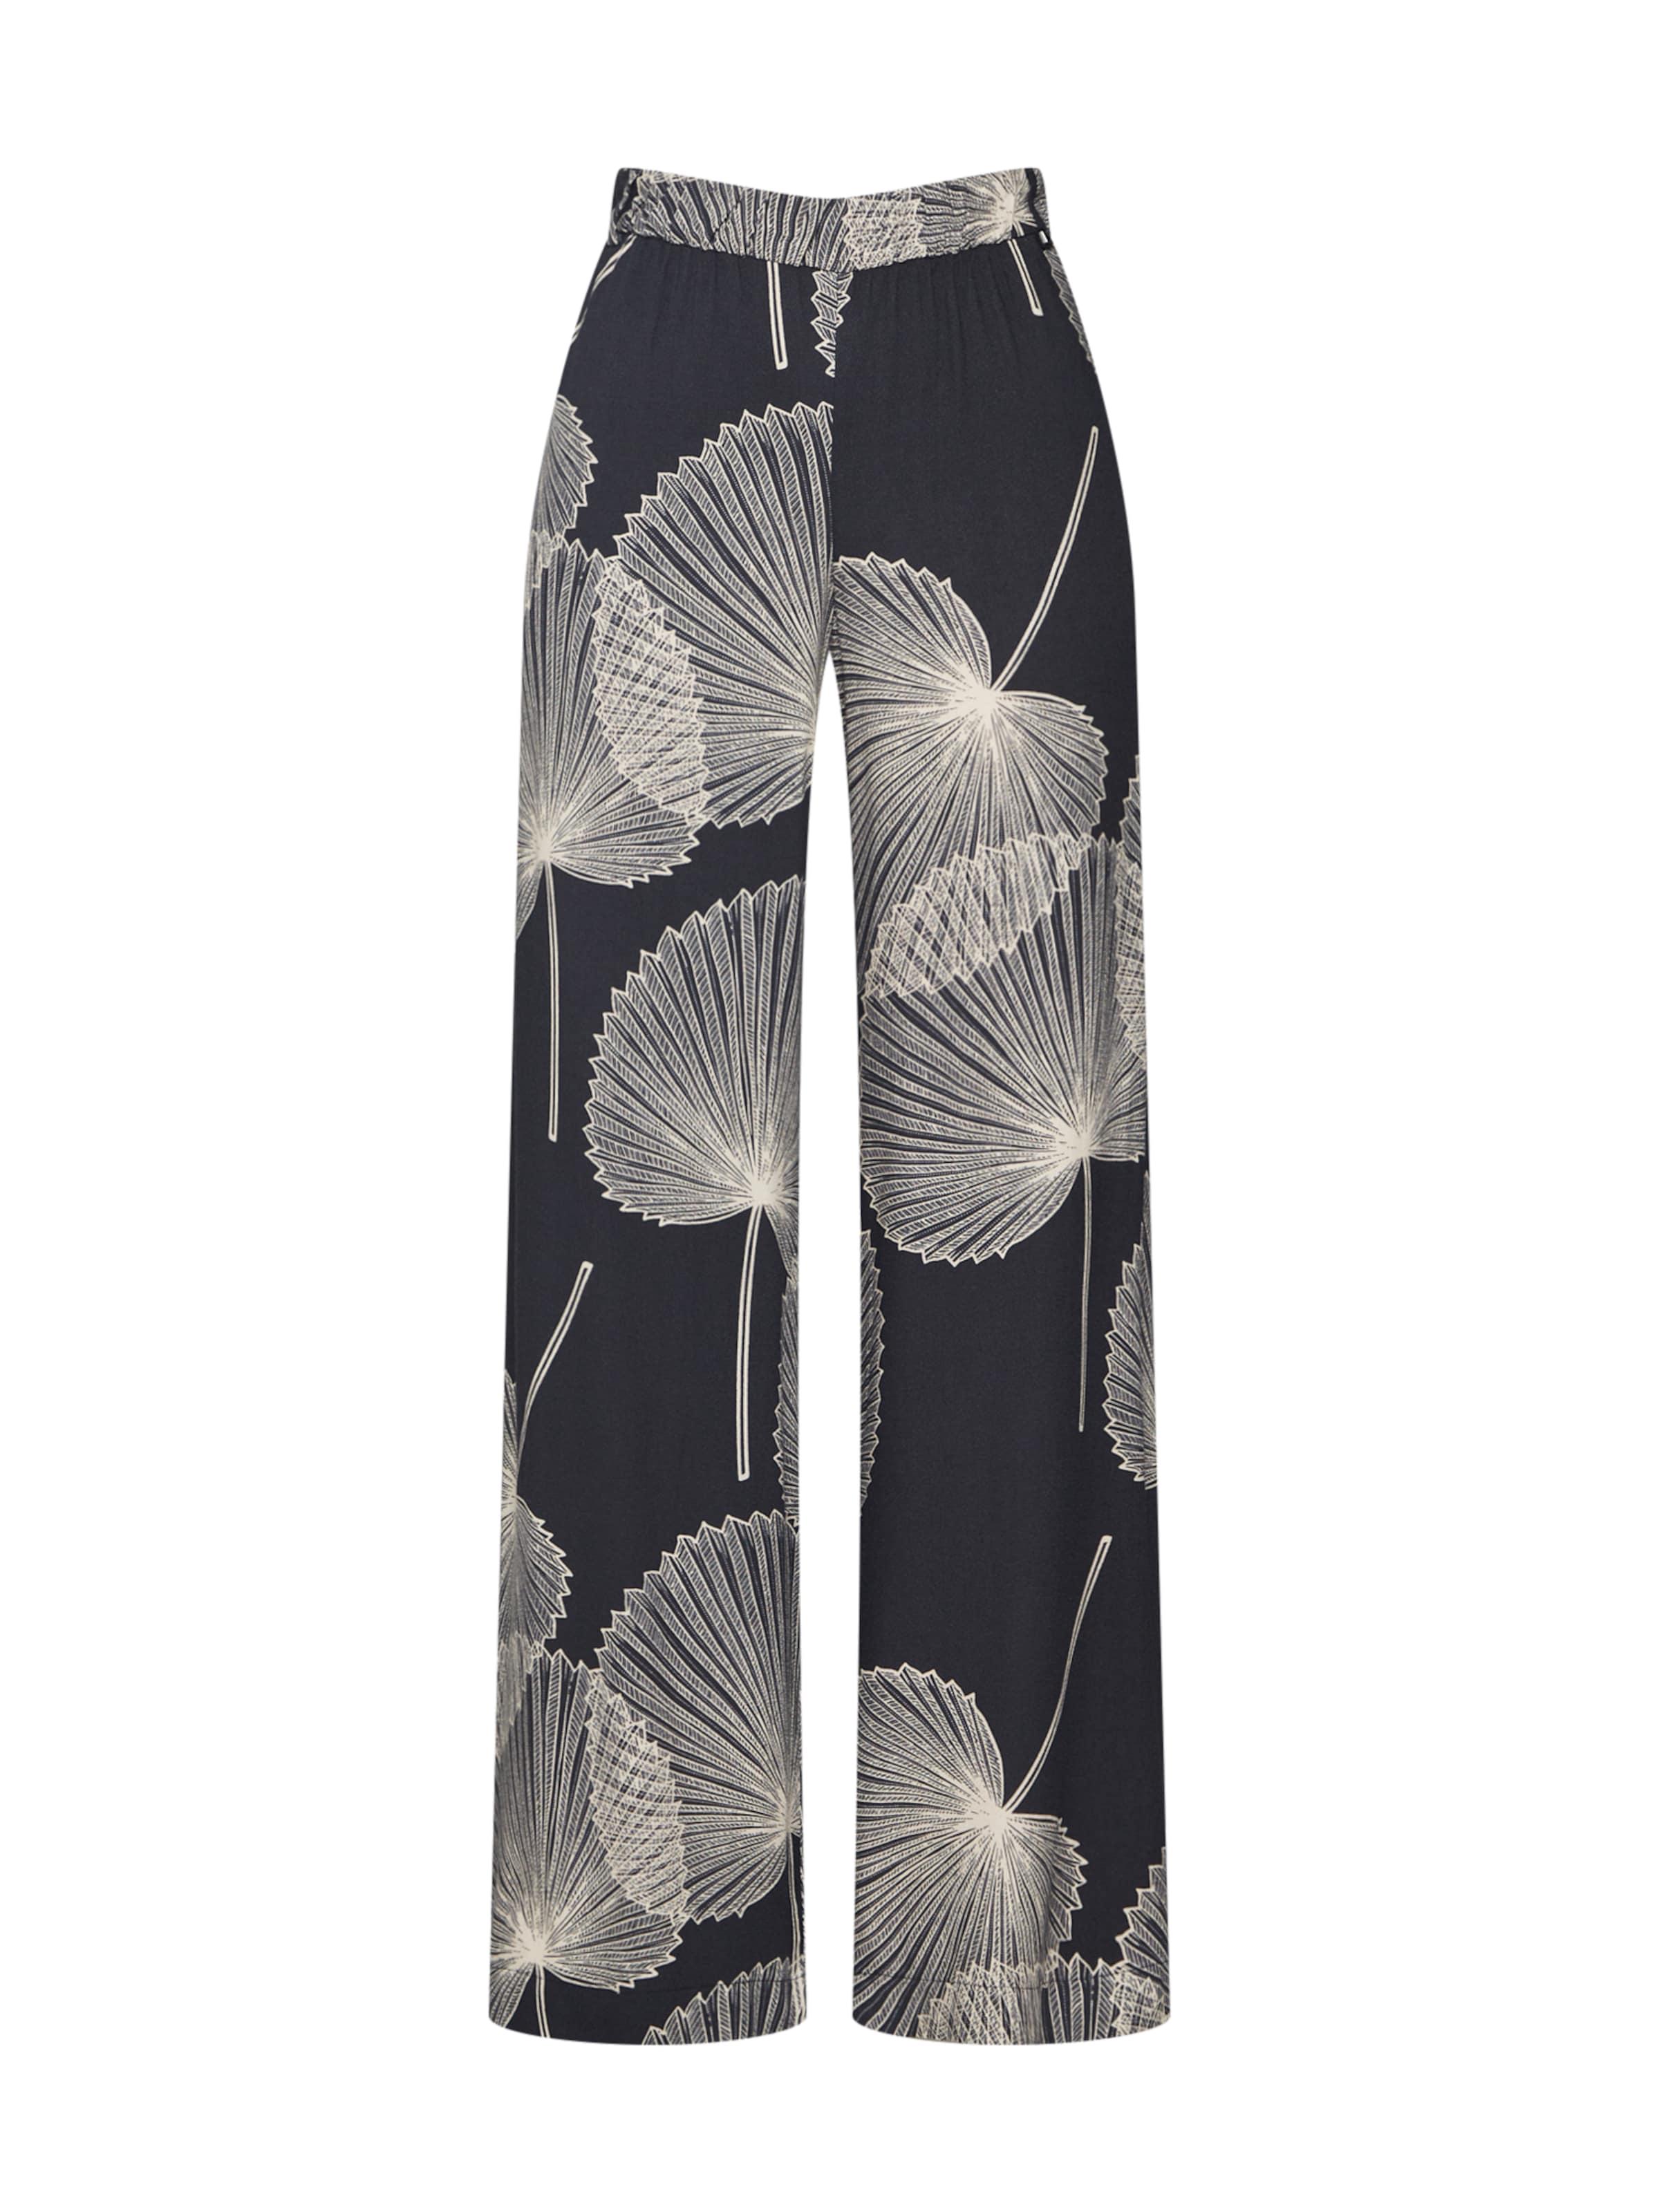 Collection Schwarz 'printedstraight' Esprit In Hose E9HYWID2